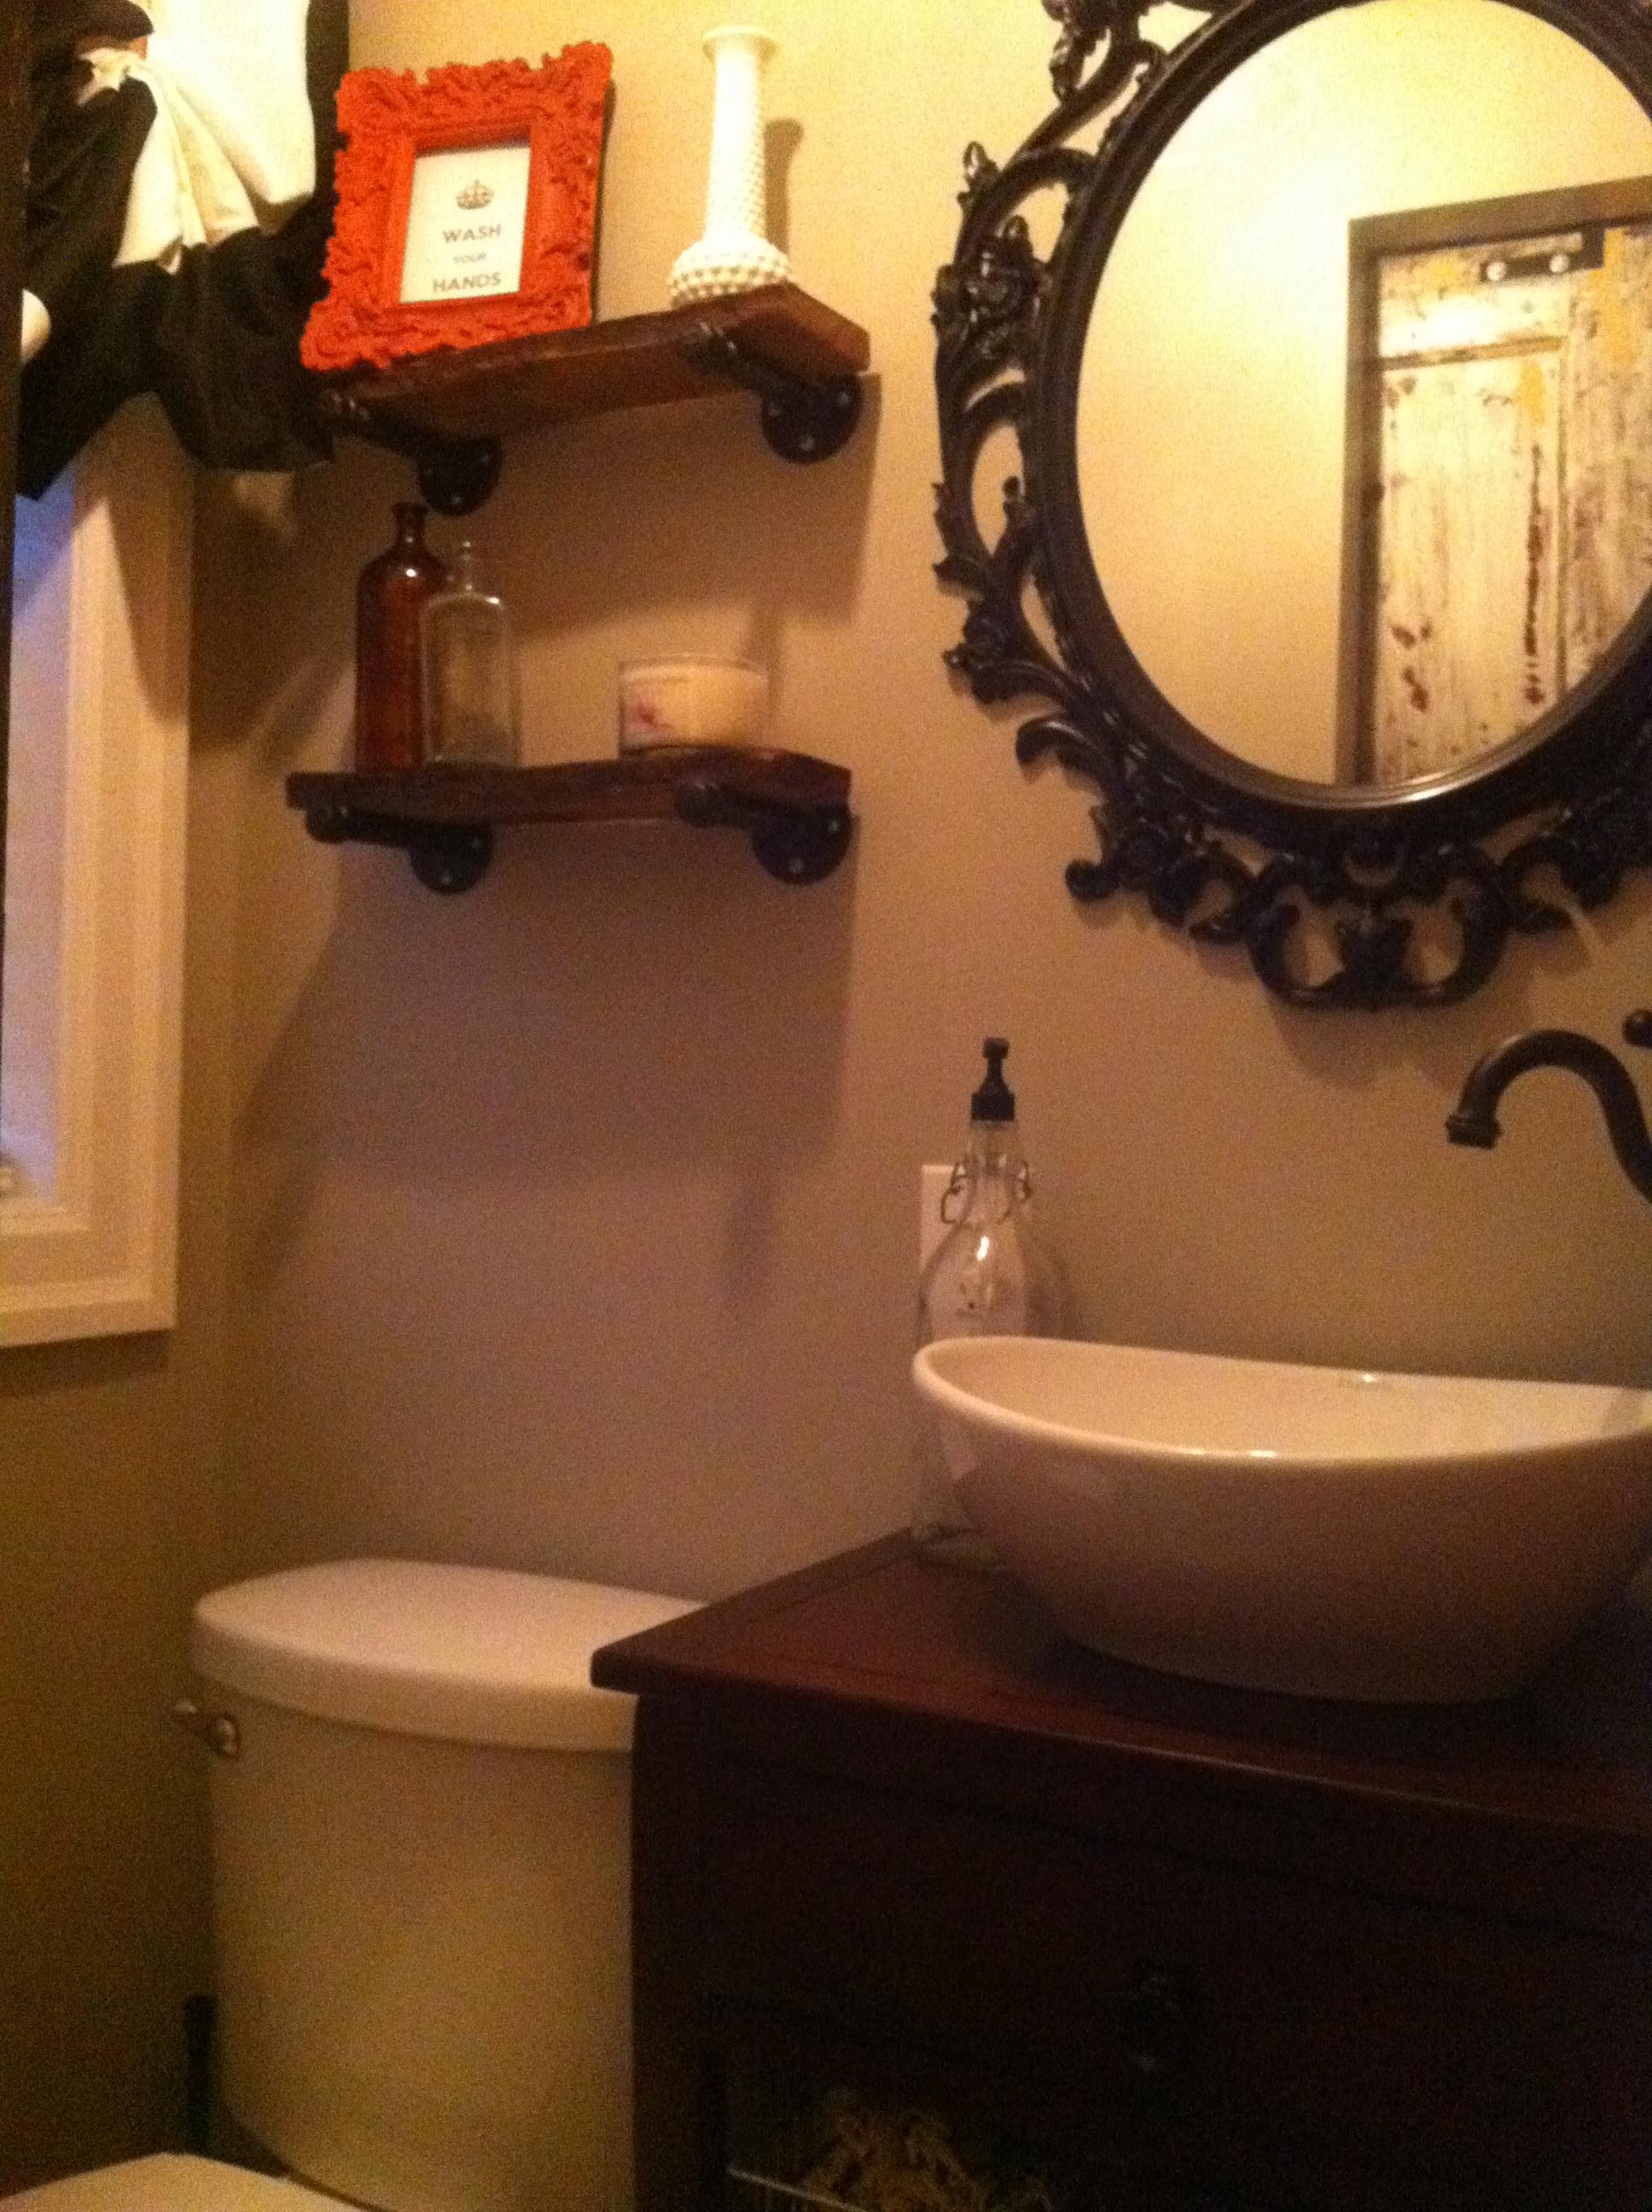 Beautiful Bathroom Mirror Circle Small Bathroom Mirrors Frameless Flat Apartment Bathroom Renovation 48 White Bathroom Vanity Cabinet Youthful Average Price Small Bathroom RedBathtub Drain Smells 2 Bath | The Staging Chick